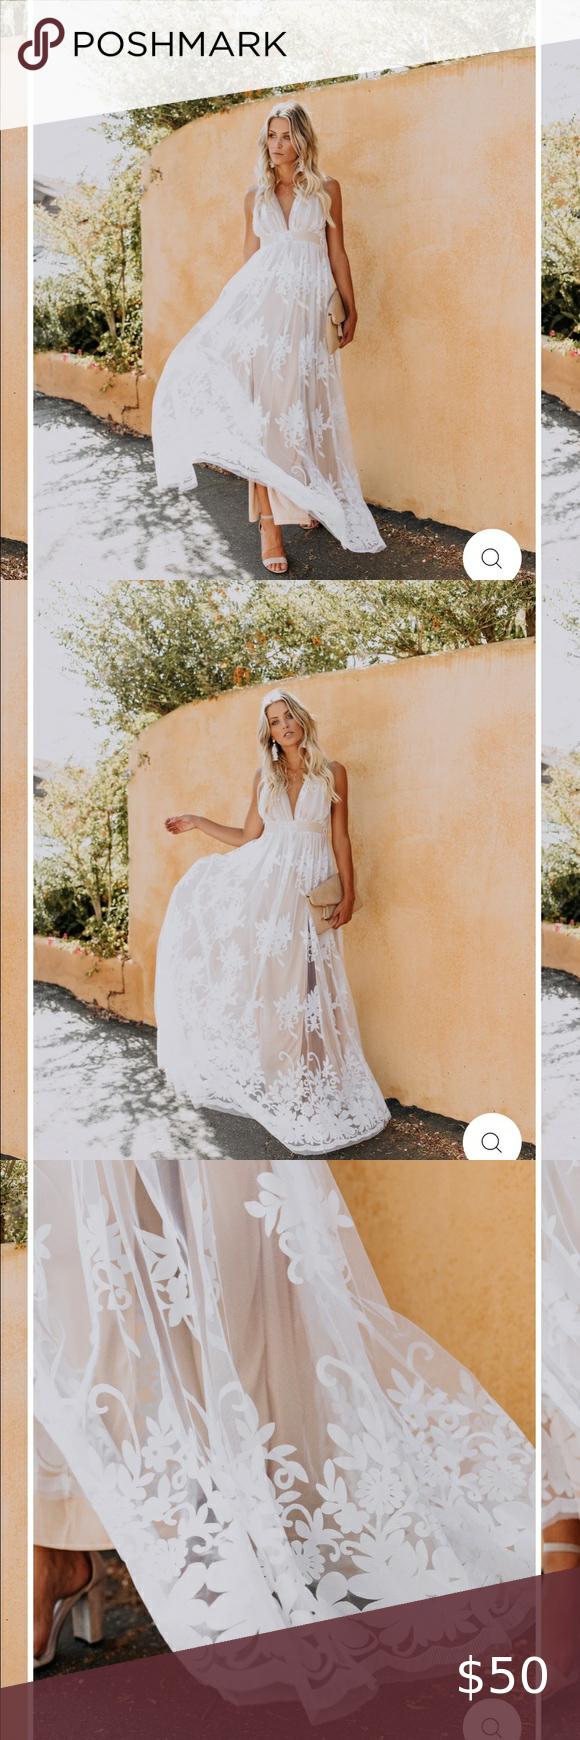 Vici Collection Antonia Maxi Dress Dresses Maxi Dress Perfect Dress [ 1740 x 580 Pixel ]